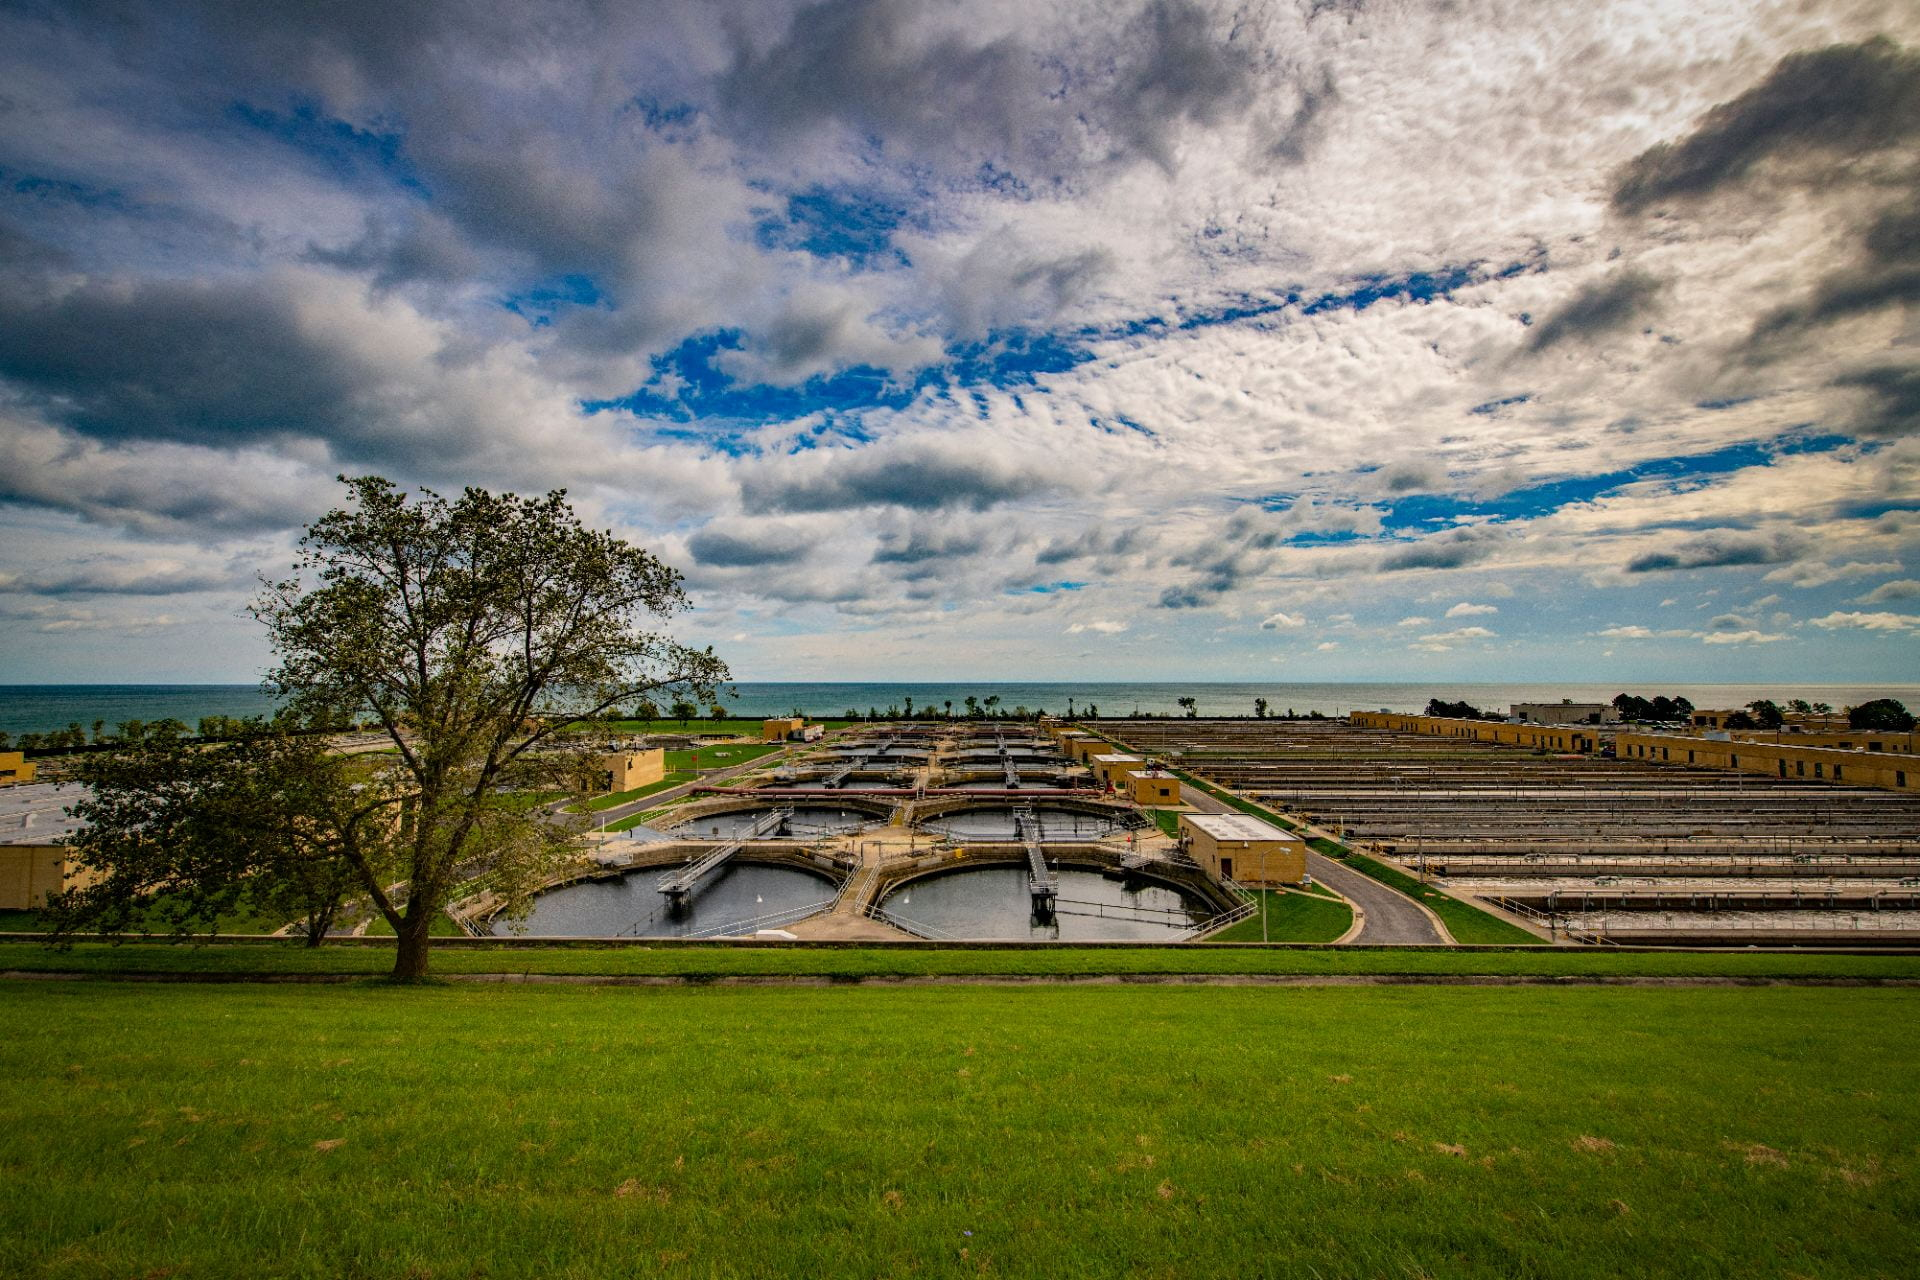 Wastewater treatment facility, Milwaukee